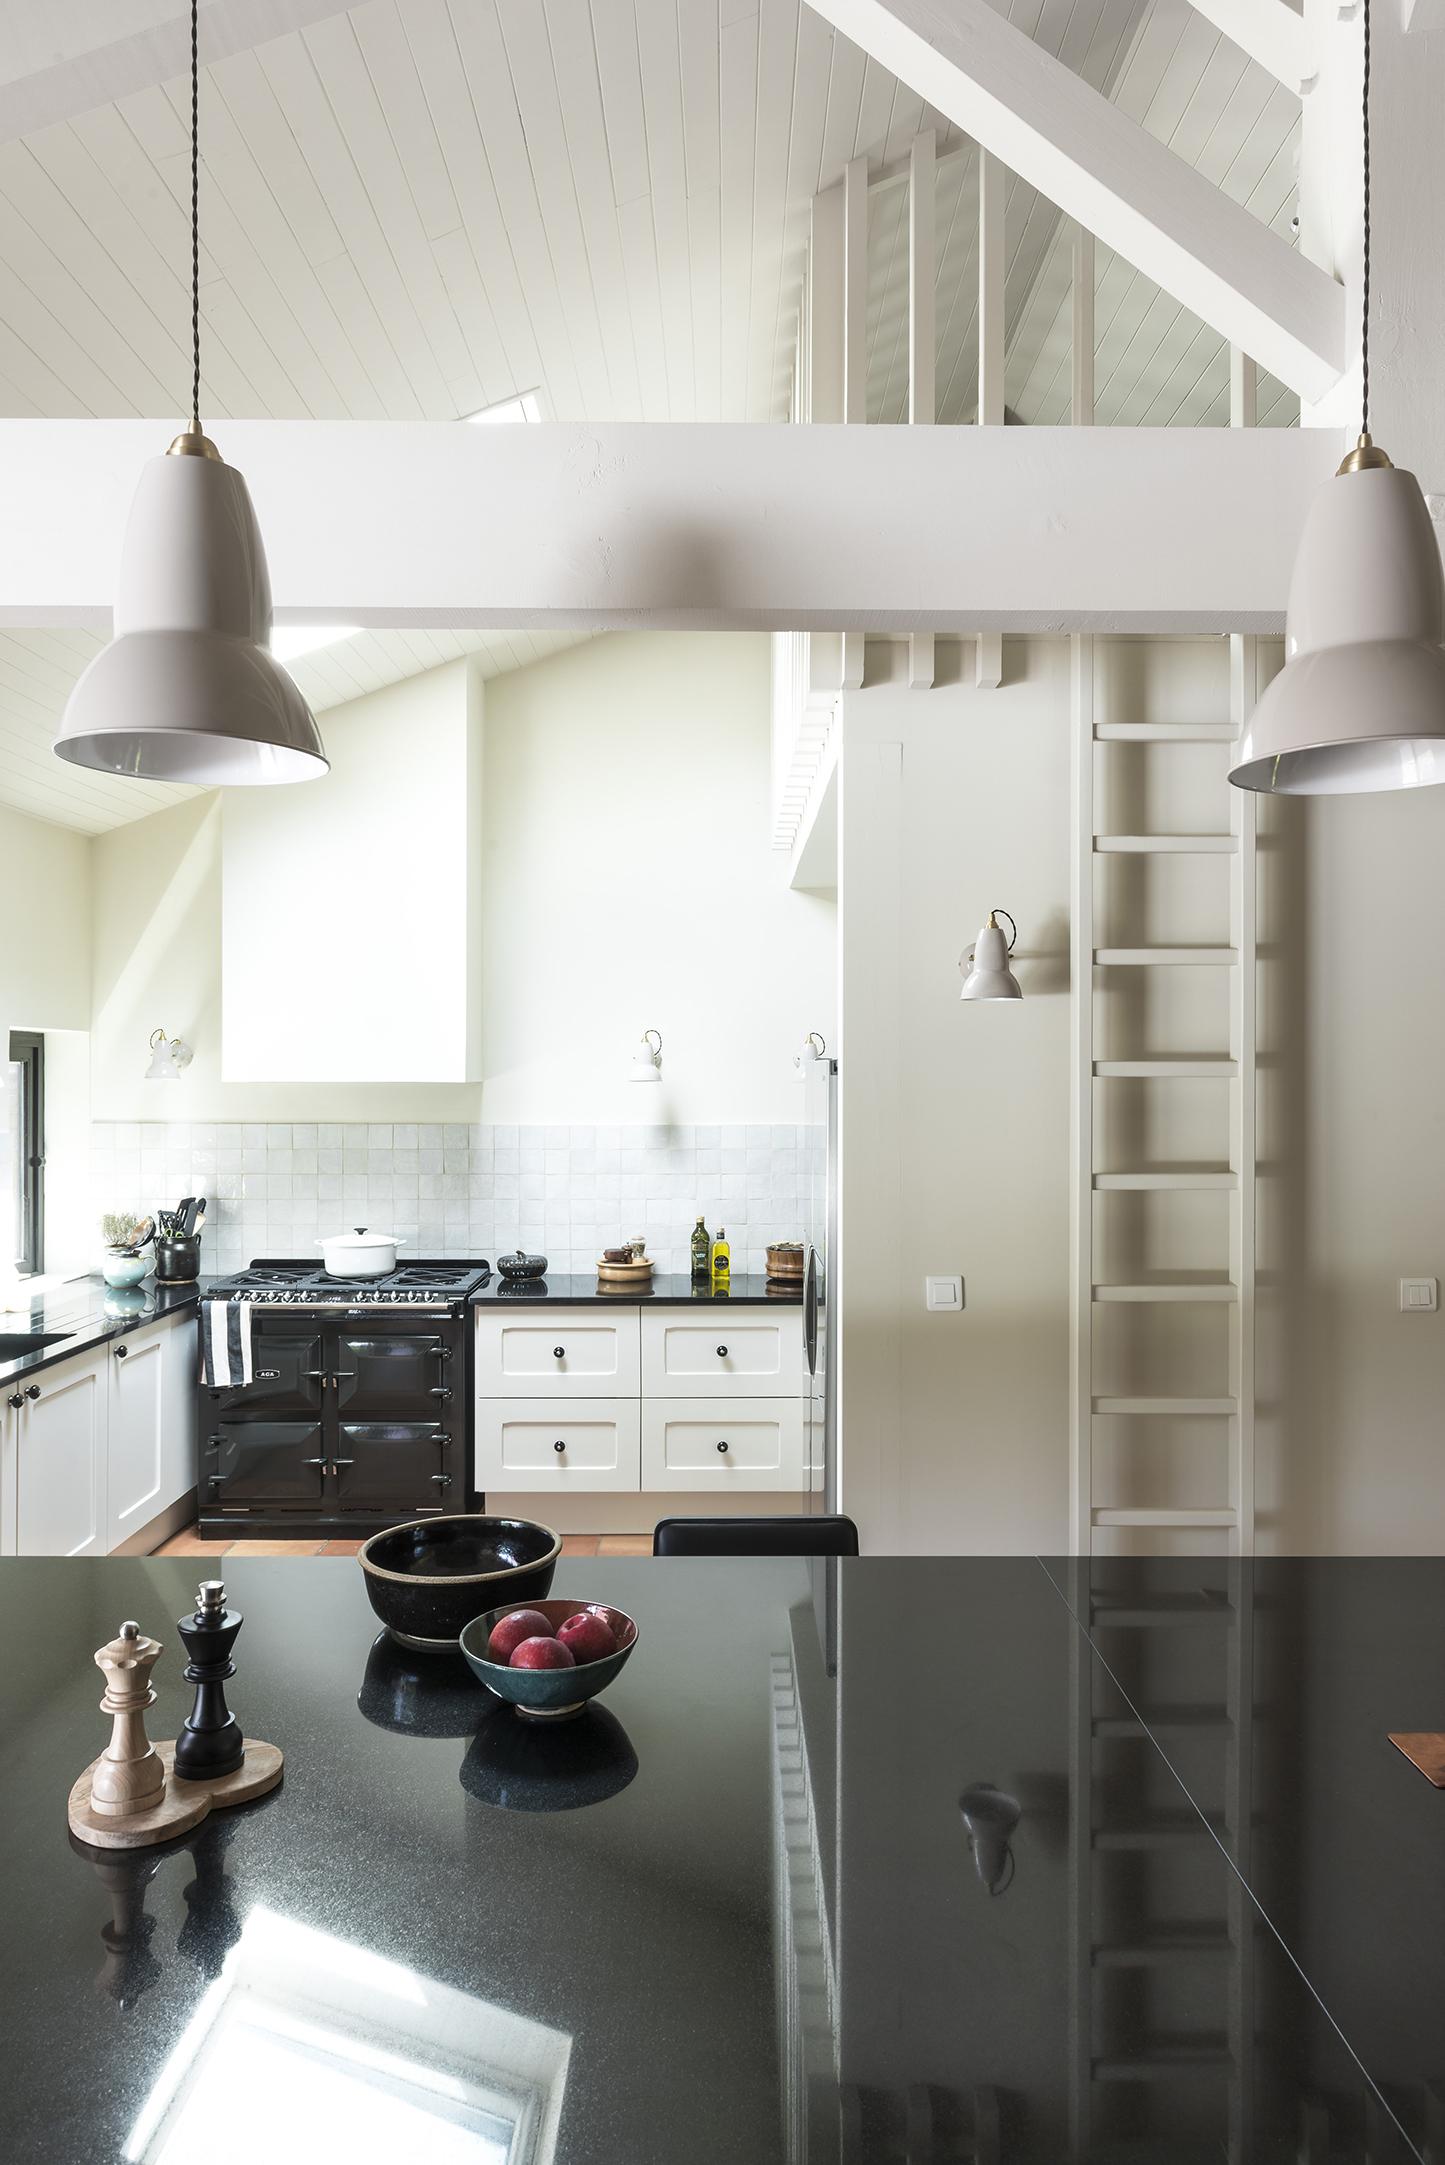 Lala Architectes_Renovation_Landes_Cuisine Black&white_Mezzanine Lattis bois